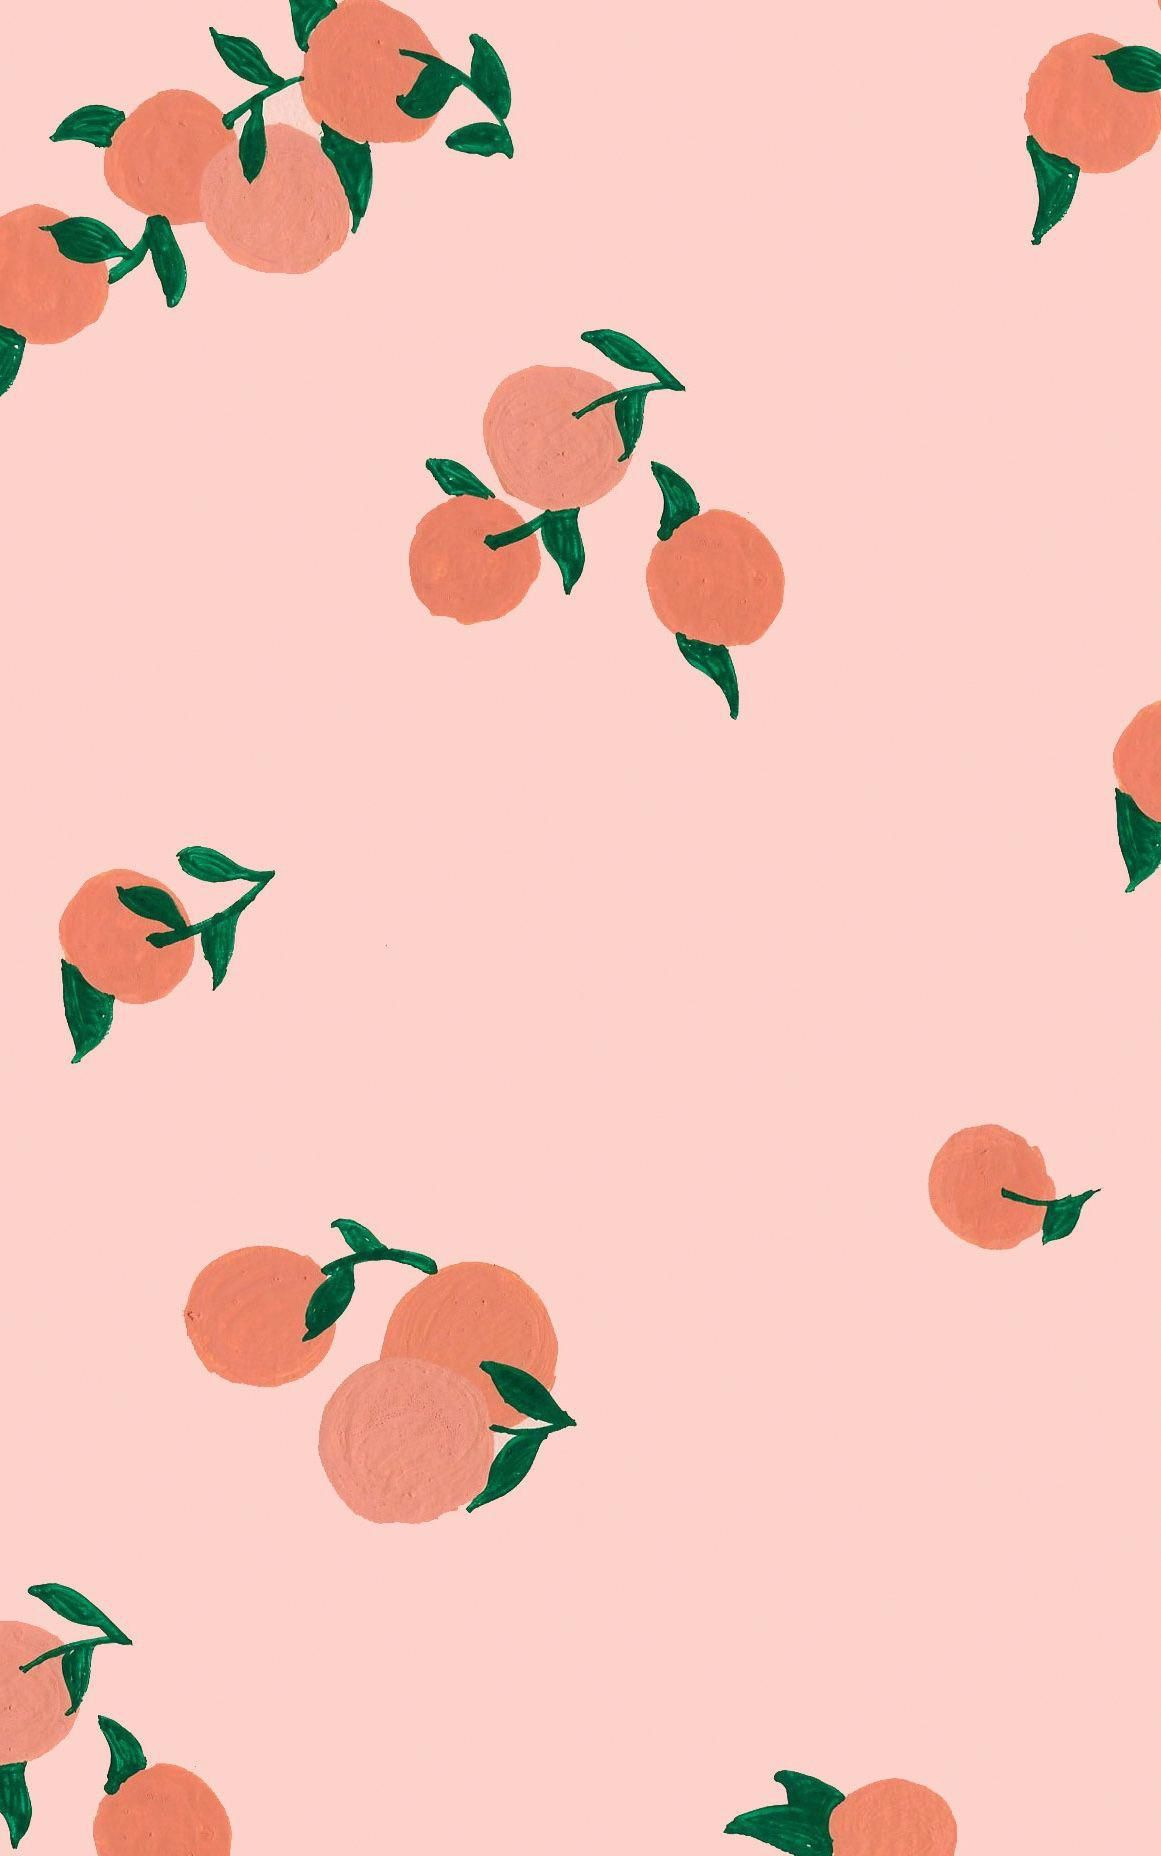 Peach Print Pattern Phone Background Wallpaper Fruit Pink Iphonewallpaper Peach Wallpaper Fruit Wallpaper Wallpaper Backgrounds